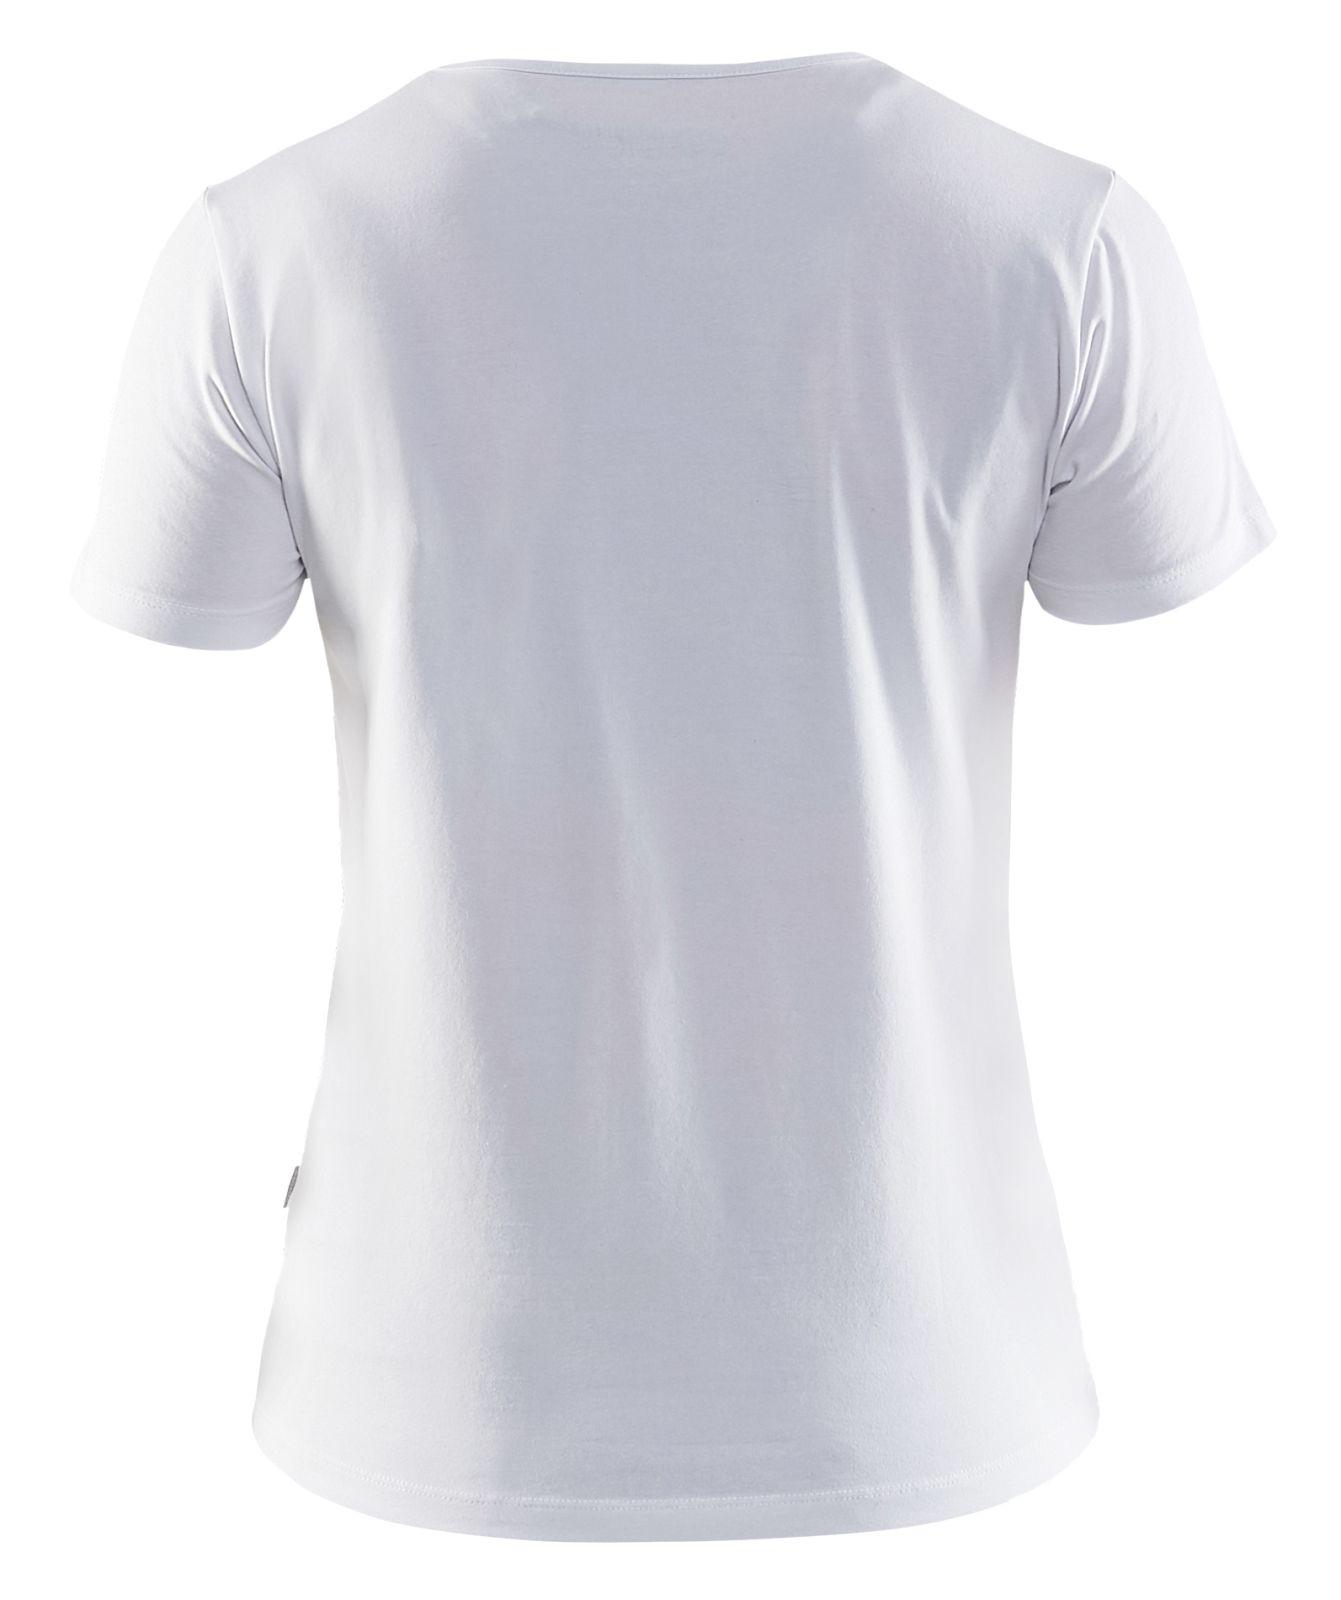 Blaklader Dames T-shirts 33041031 wit(1000)